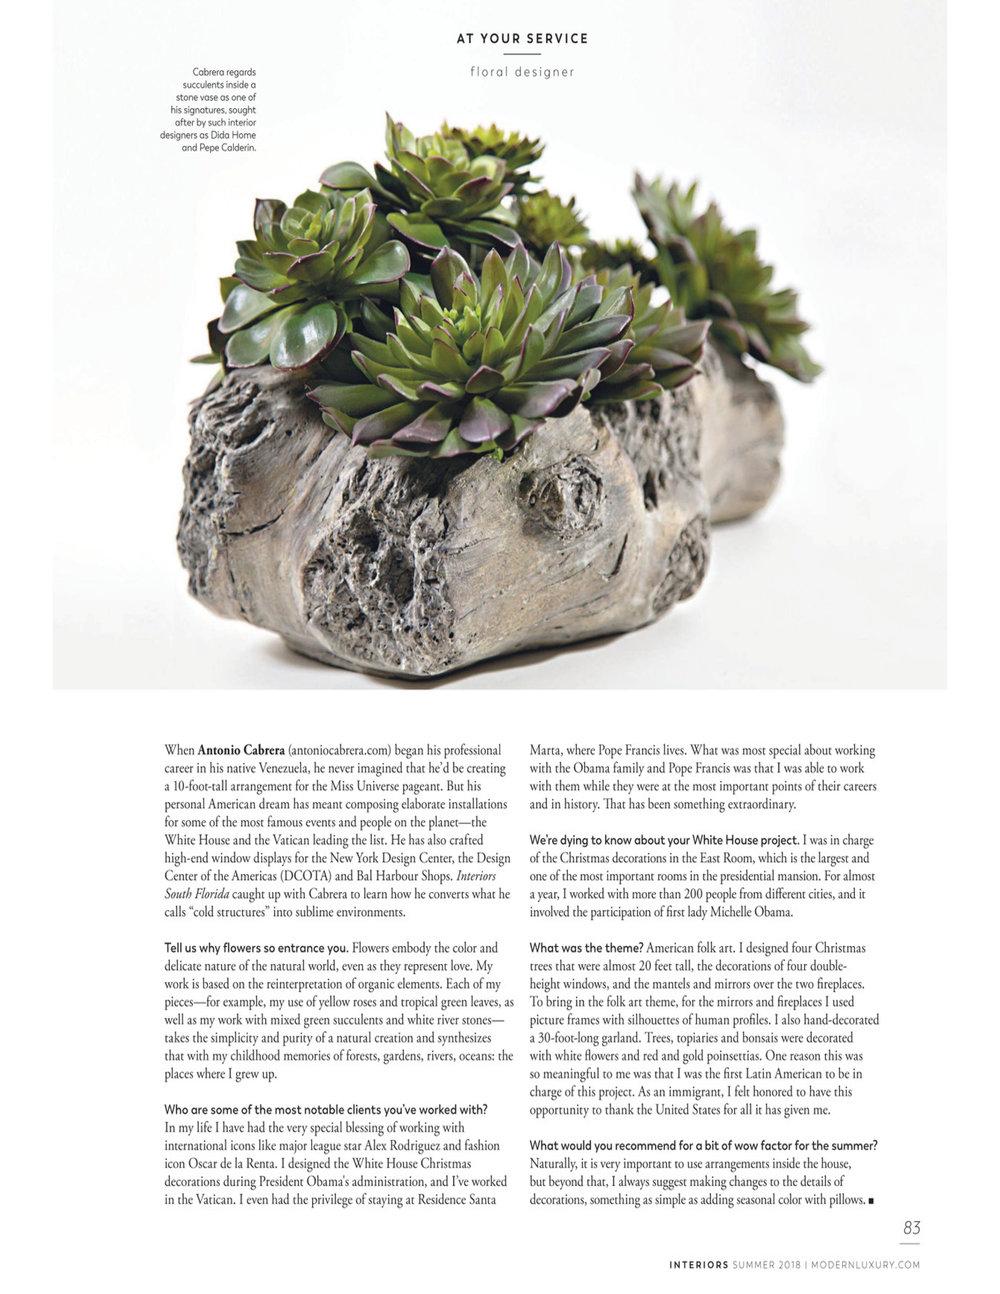 Modern Luxury Interiors South Florida Digital Edition _ Modern Luxury ANTONIO CABRERA-2.jpg